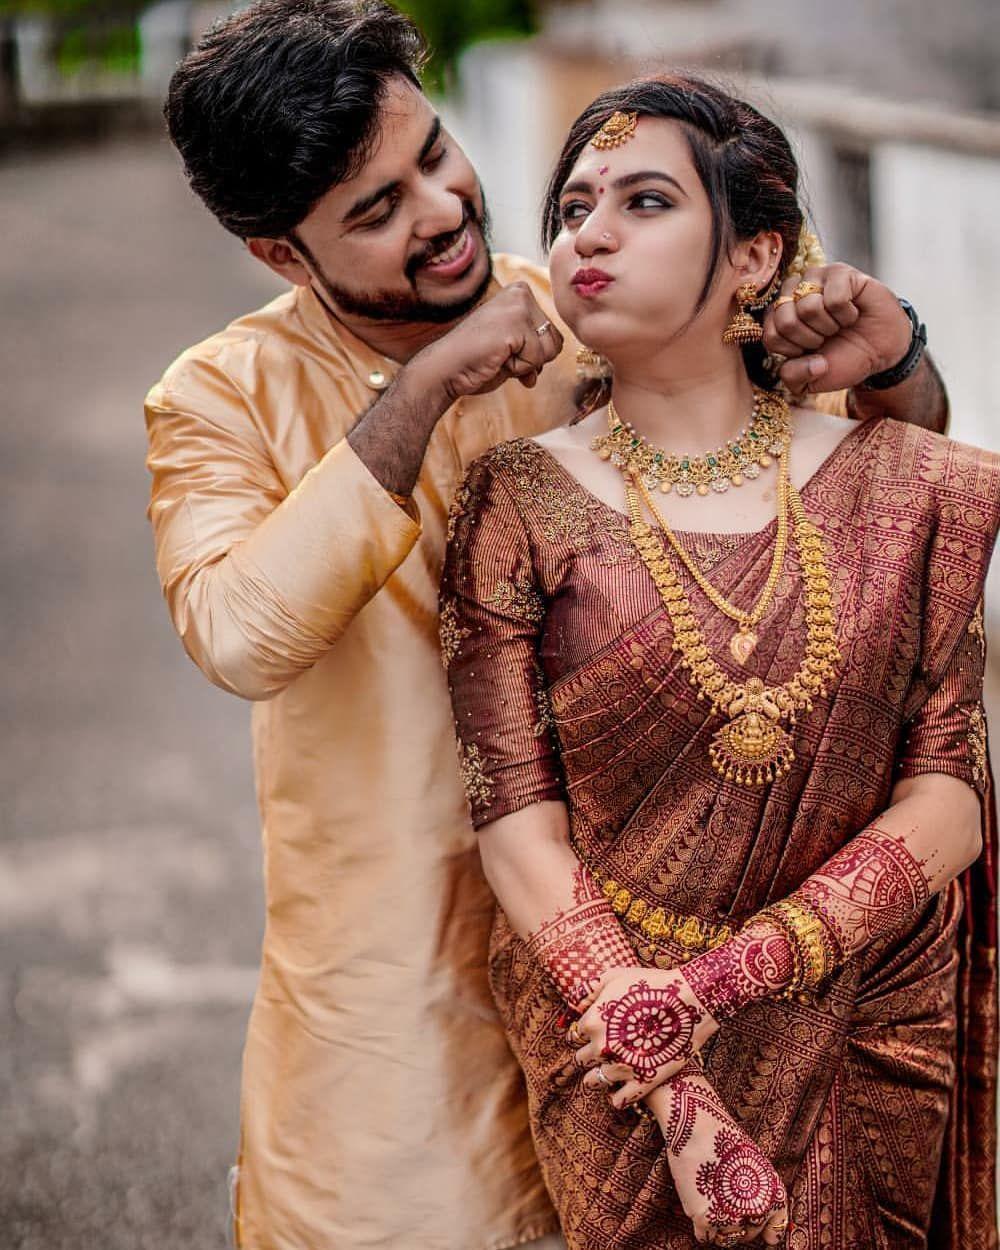 9 520 Likes 19 Comments Kerala Wedding Styles Keralaweddingstyl Indian Wedding Photography Poses Bridal Photography Poses Wedding Couple Poses Photography